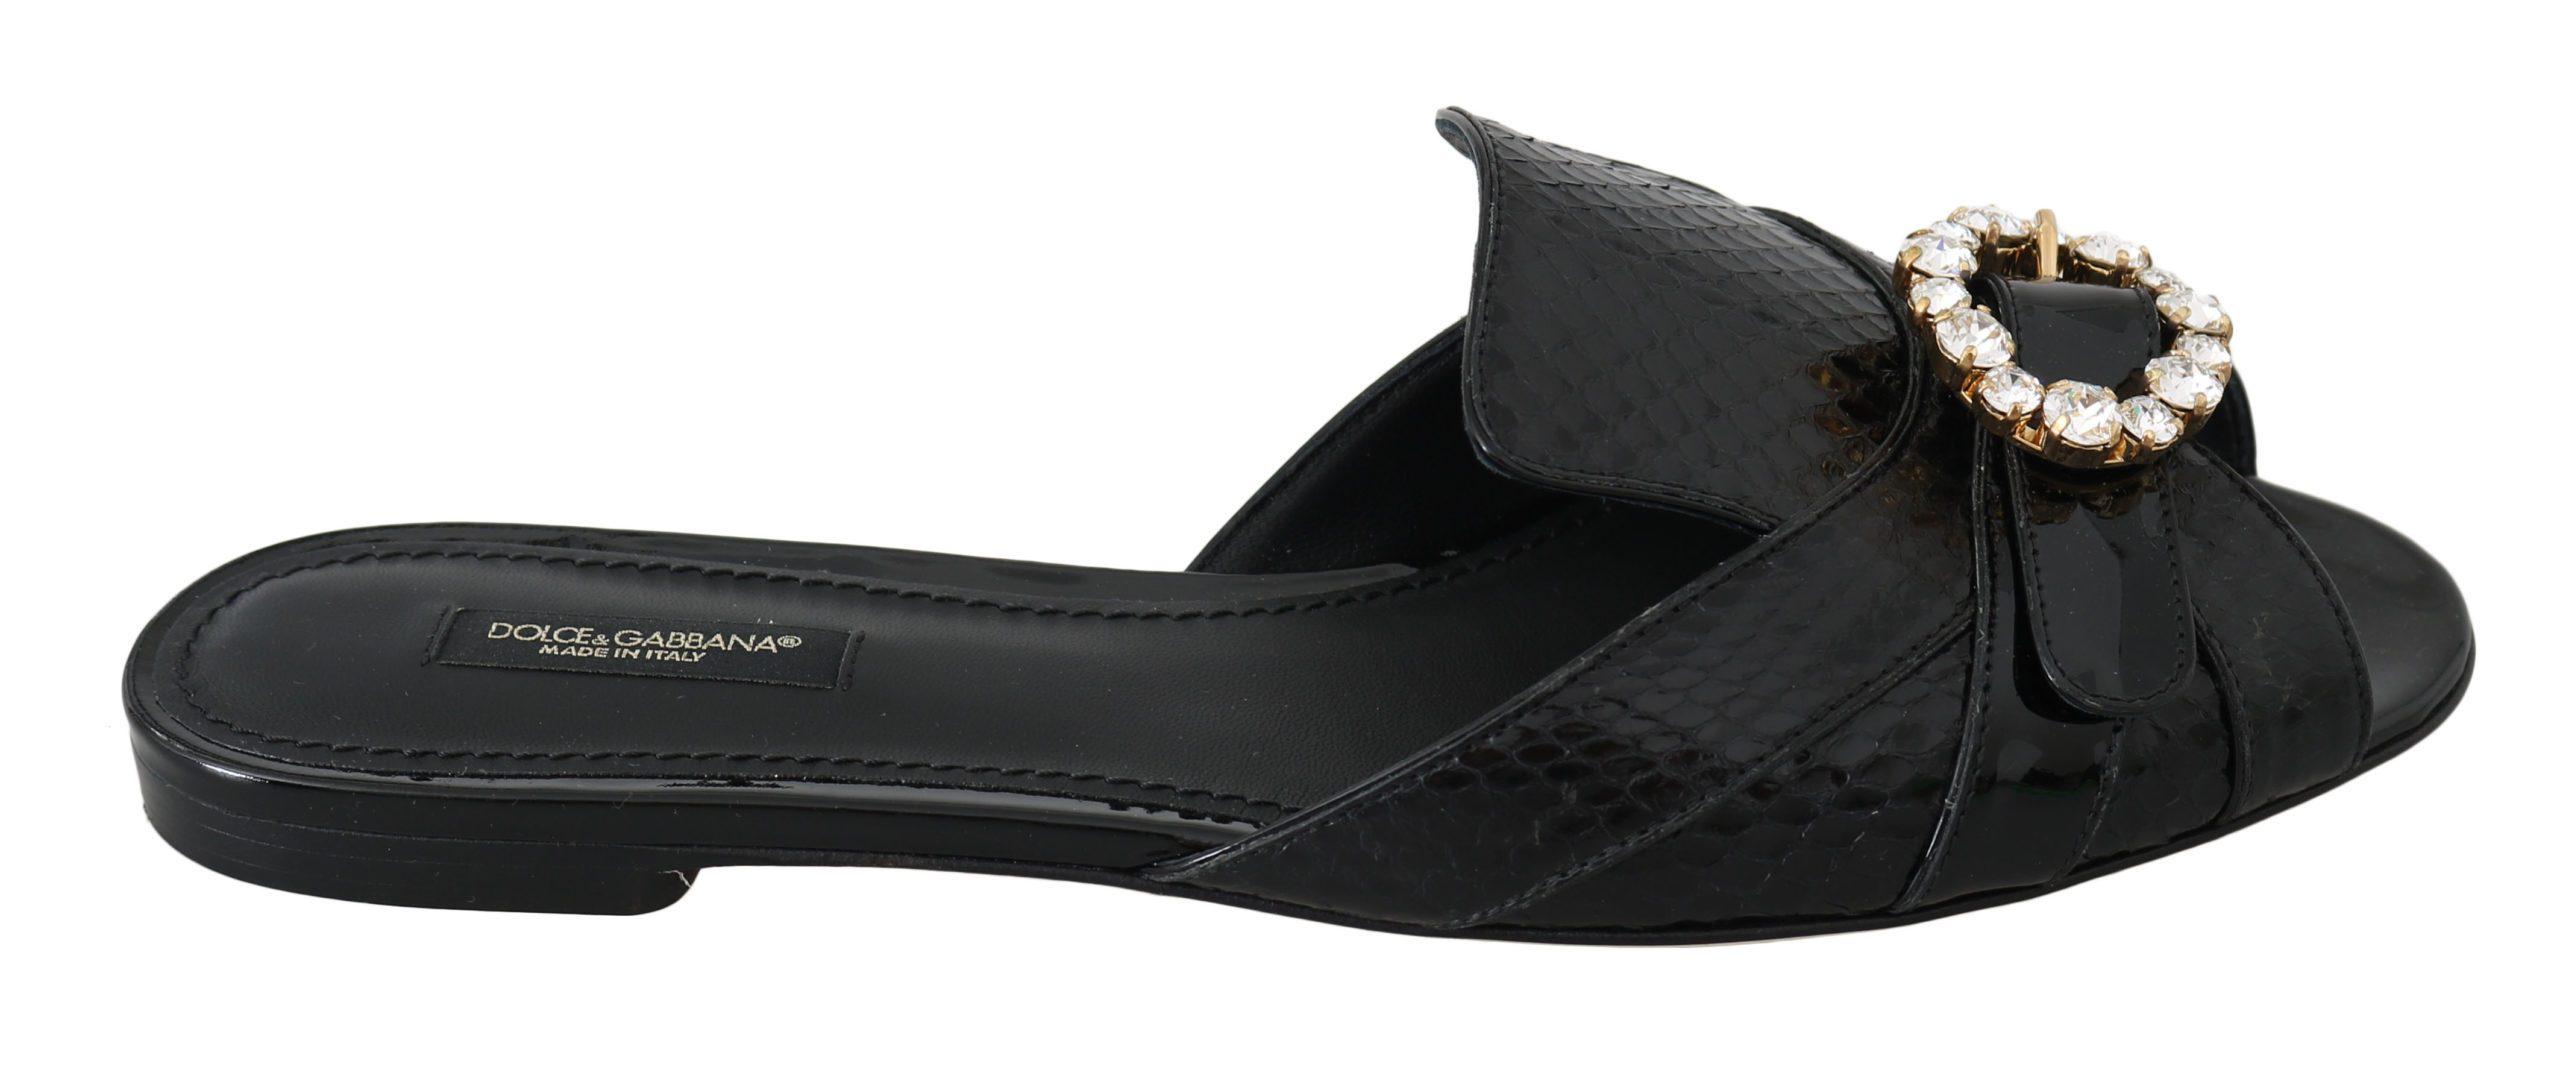 Dolce & Gabbana Leather Flats Black LA6293-36 - EU36/US5.5